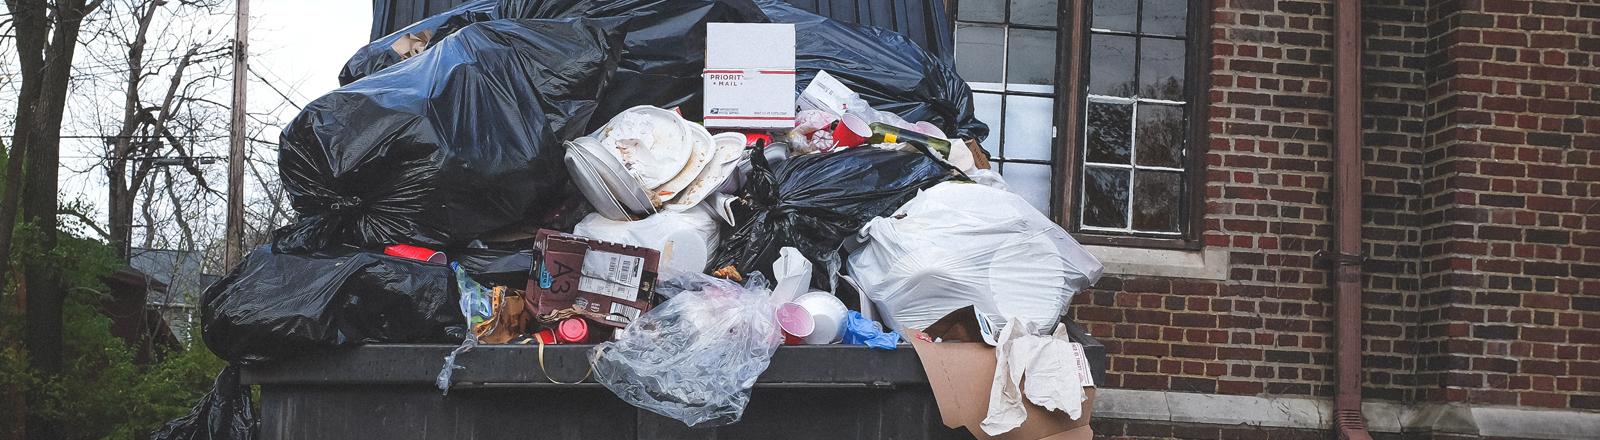 Überfüllte Mülltonne